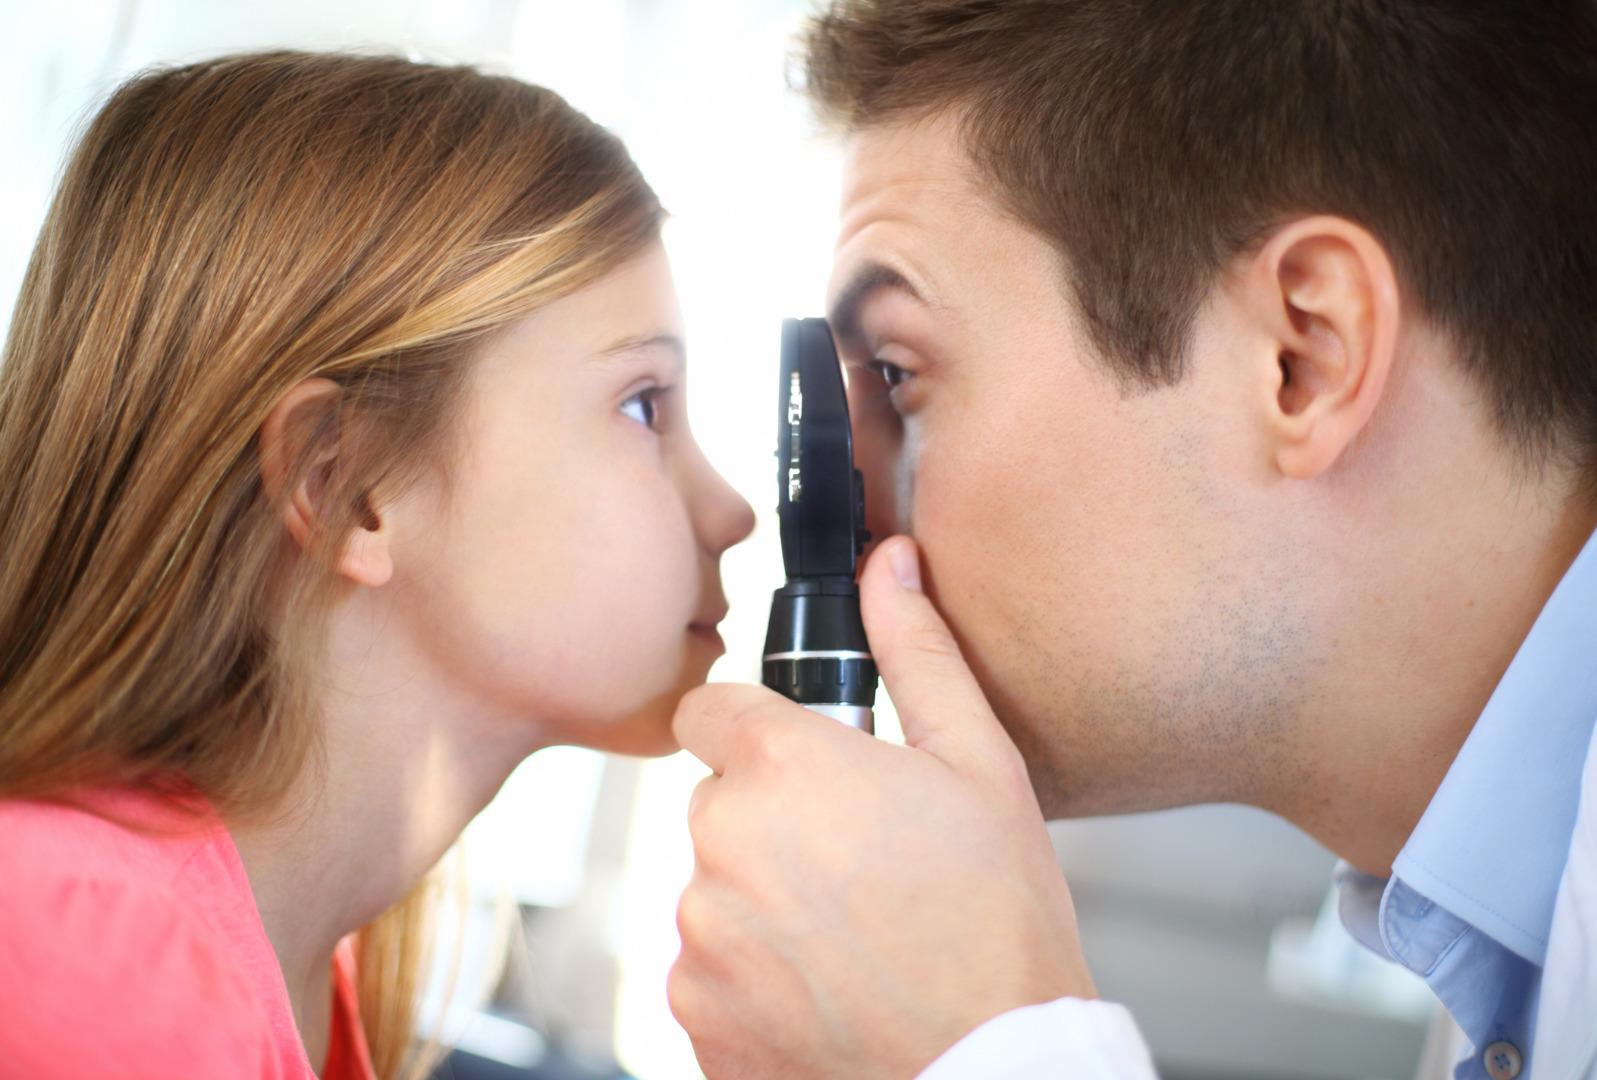 Конъюнктивит у ребенка: как лечить?